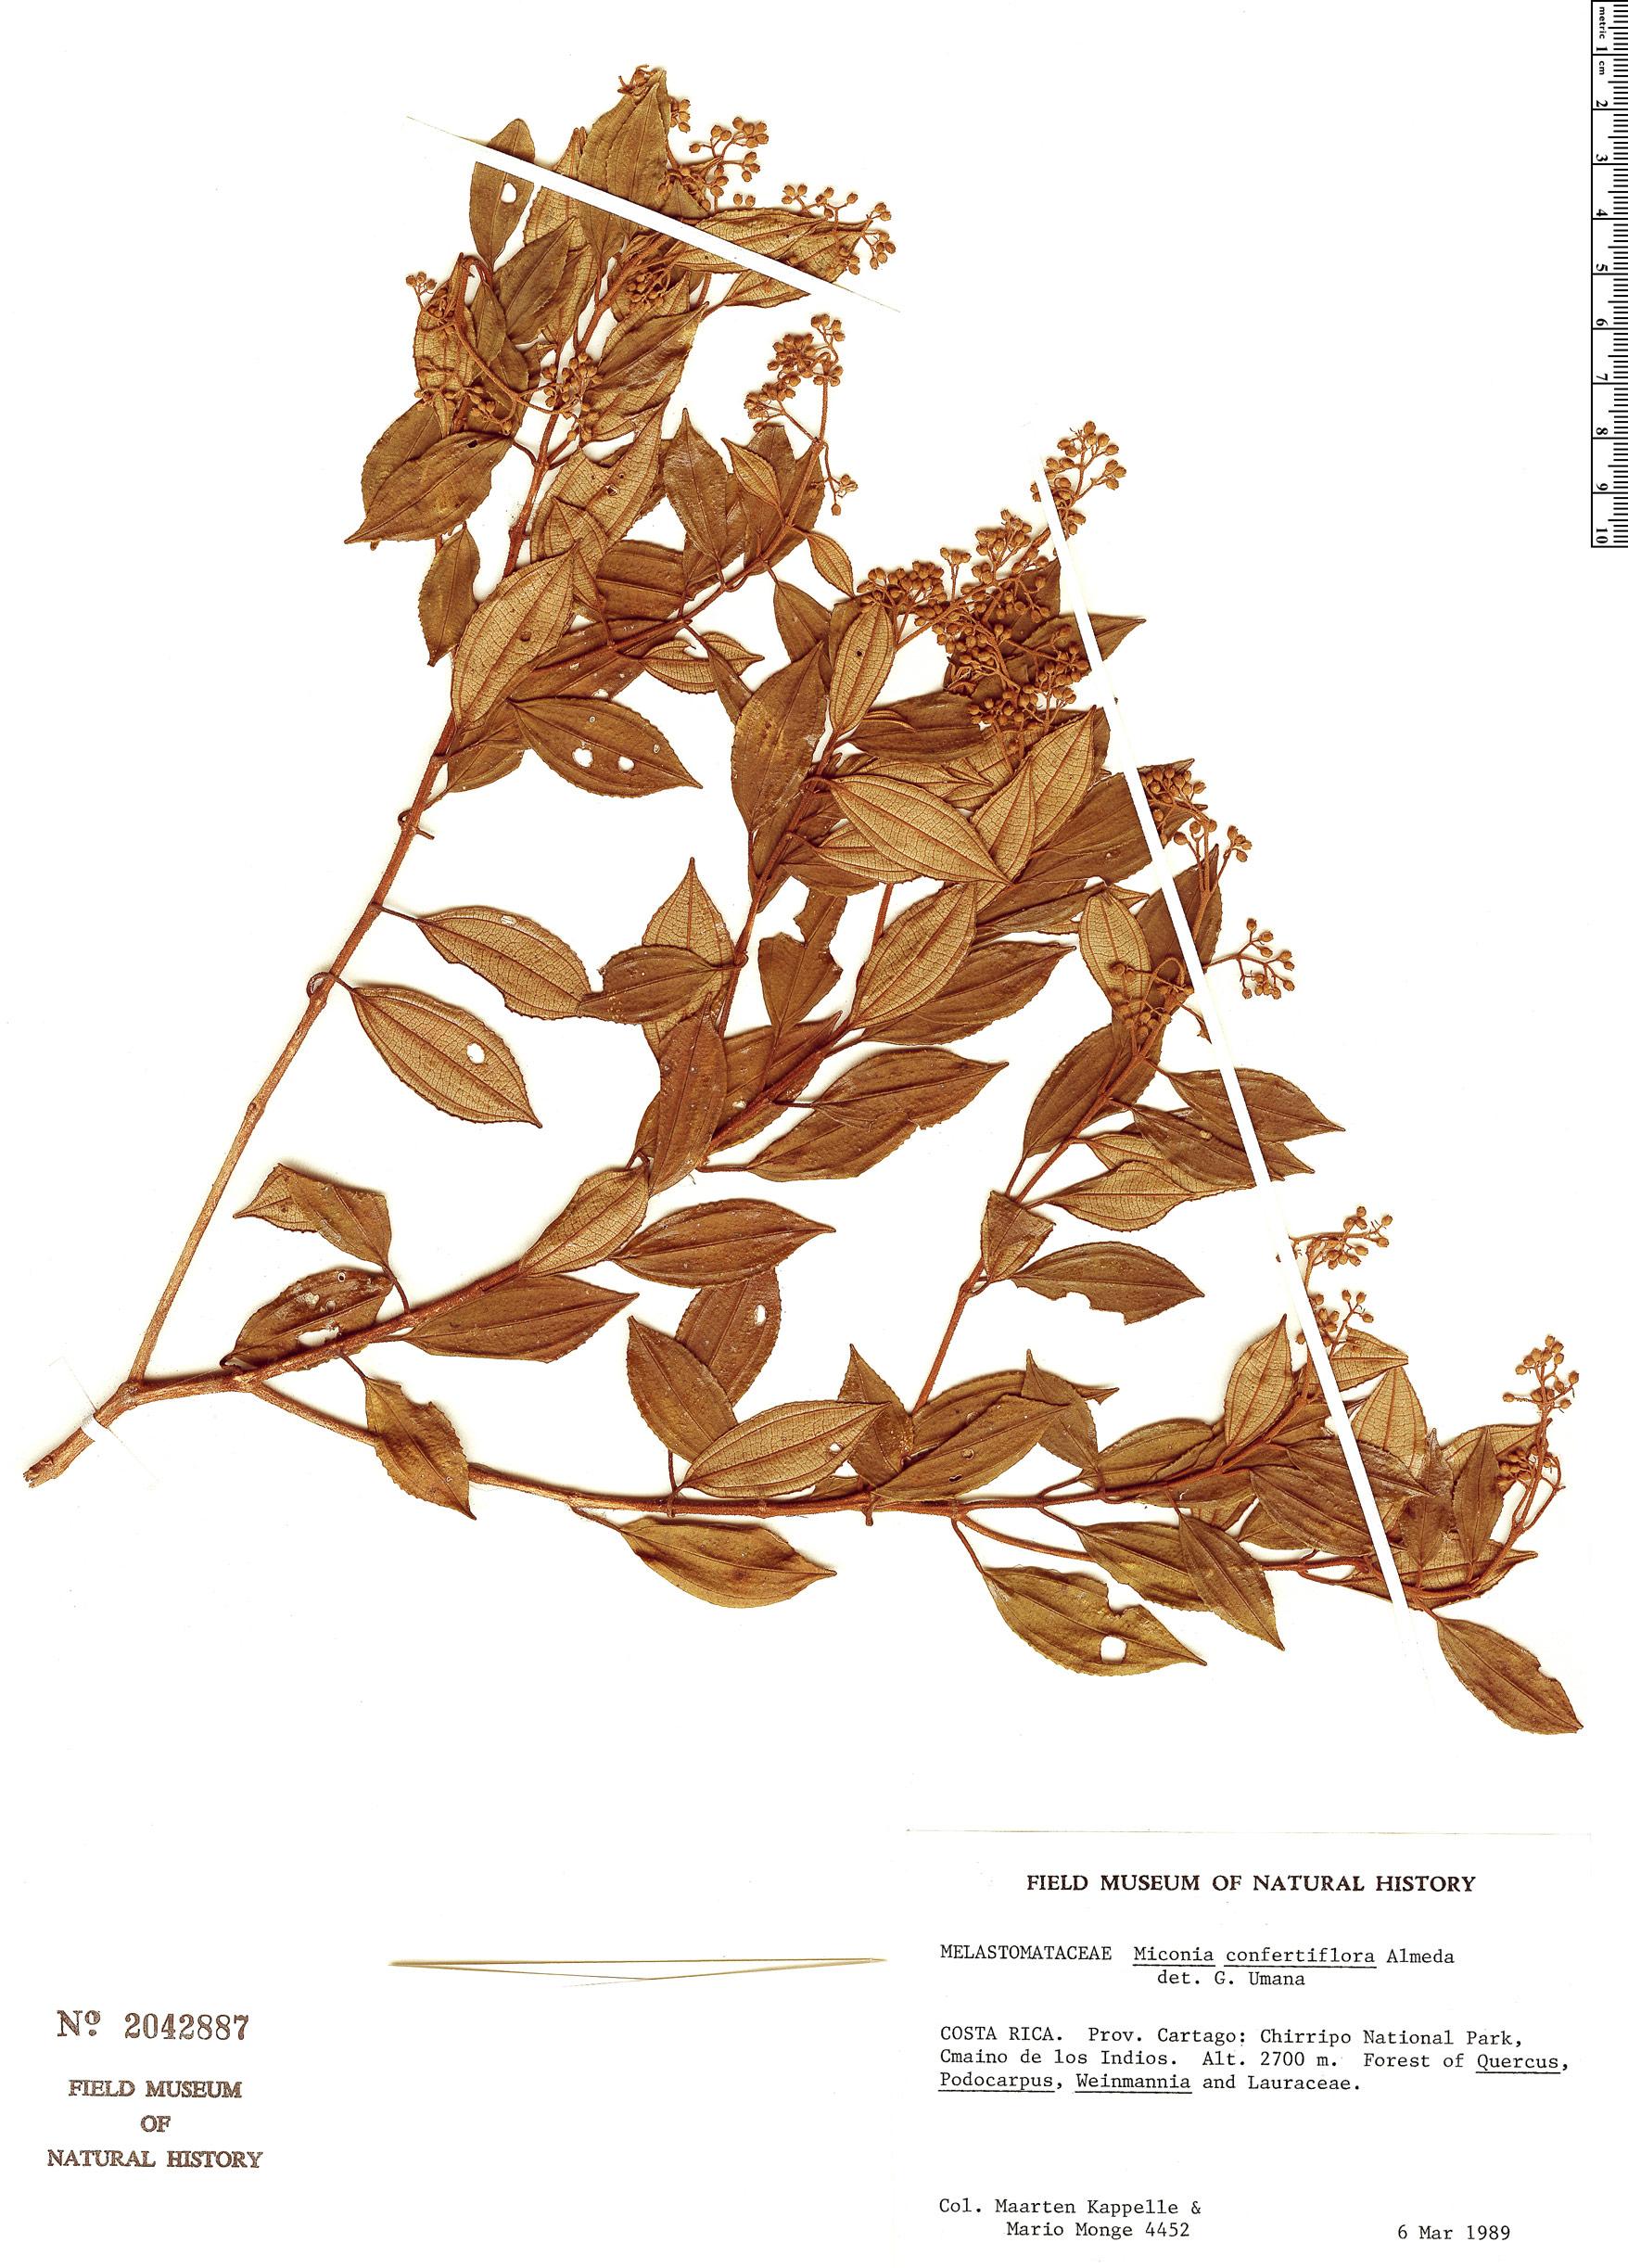 Specimen: Miconia confertiflora